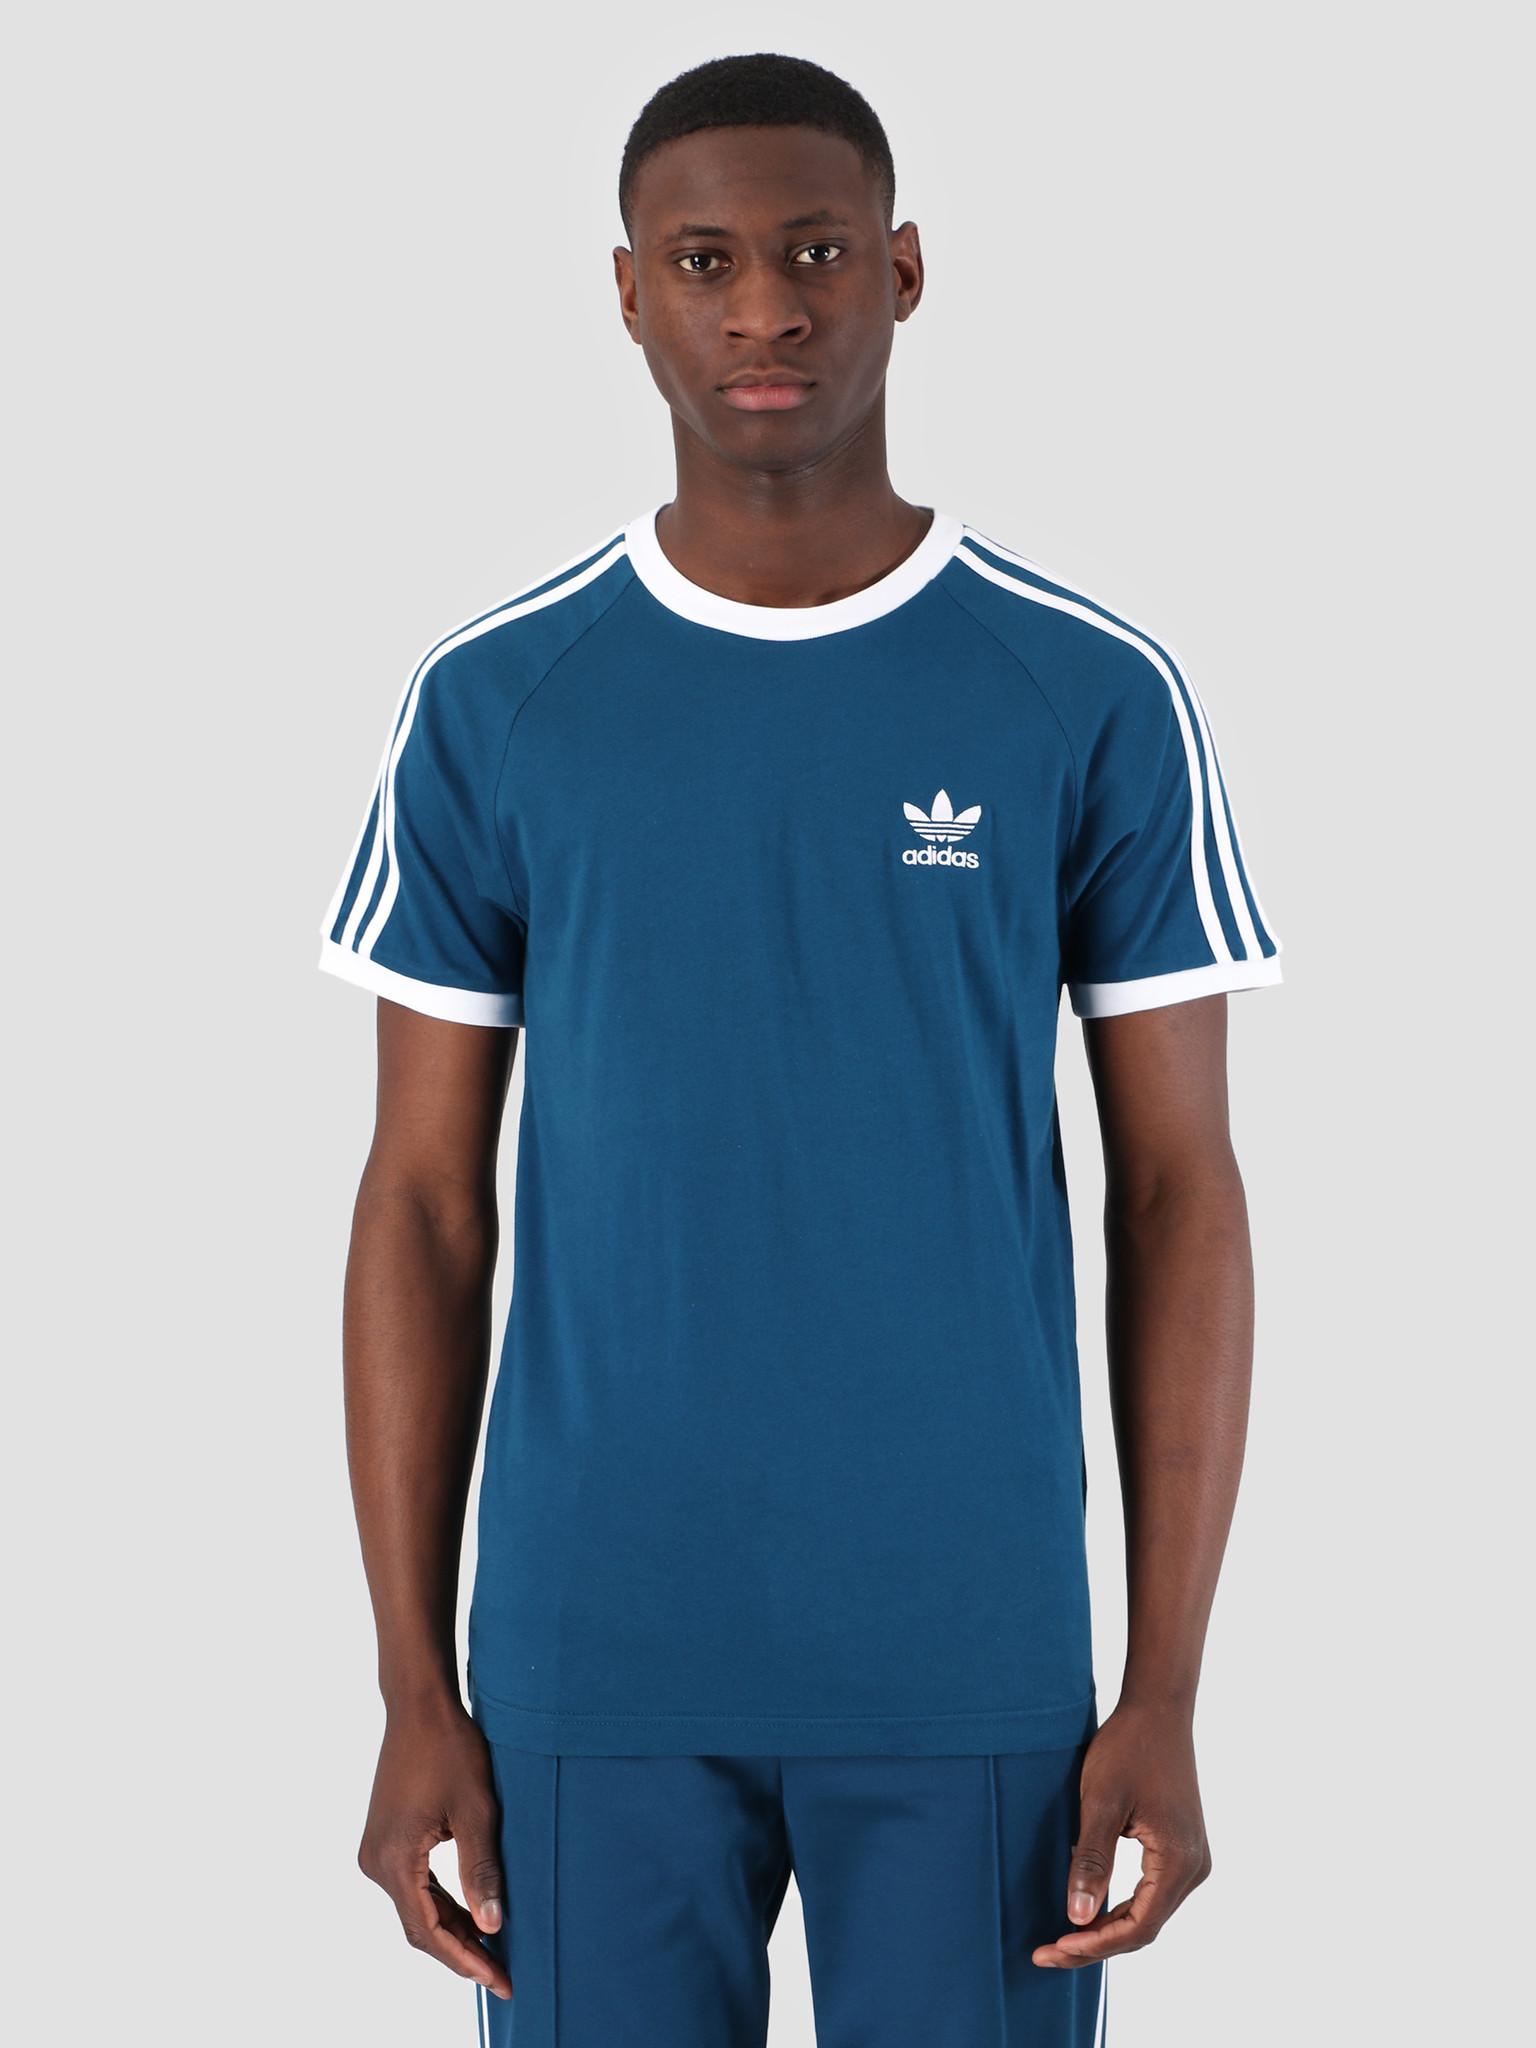 d580f433f43 adidas adidas 3-Stripes T-Shirt Legmar DV1564